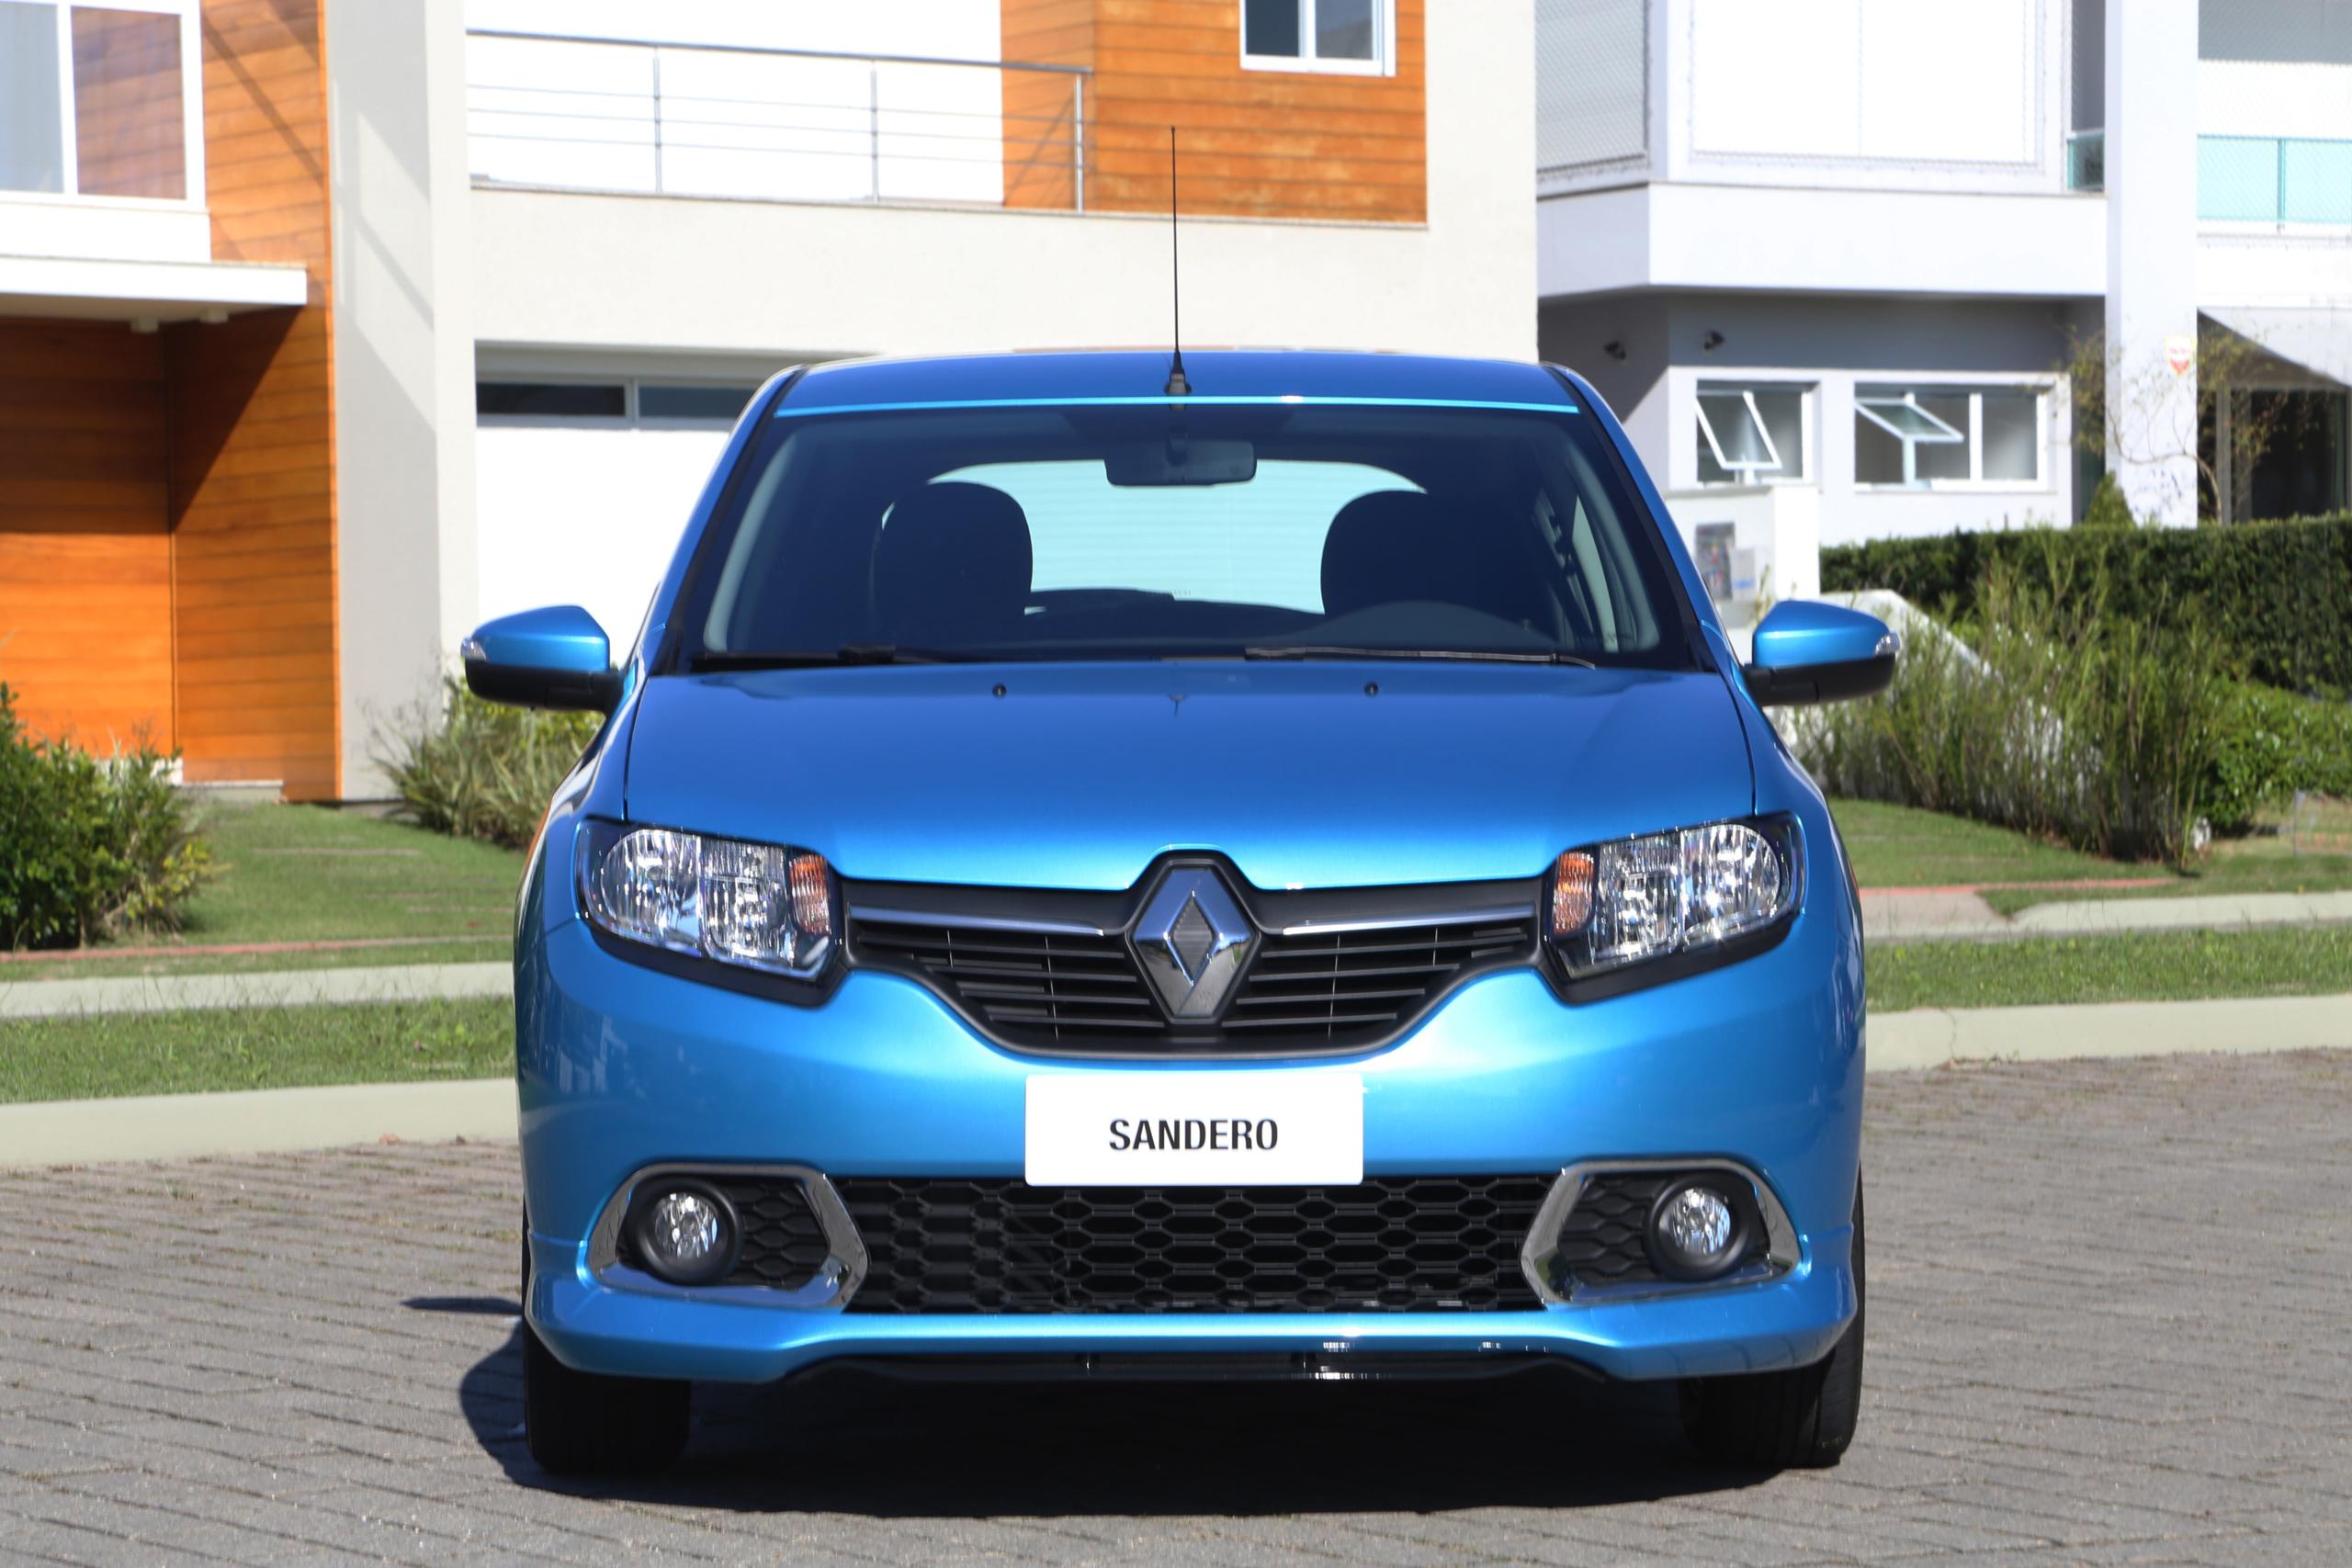 Foto de Renault Sandero 2017 (10/11)